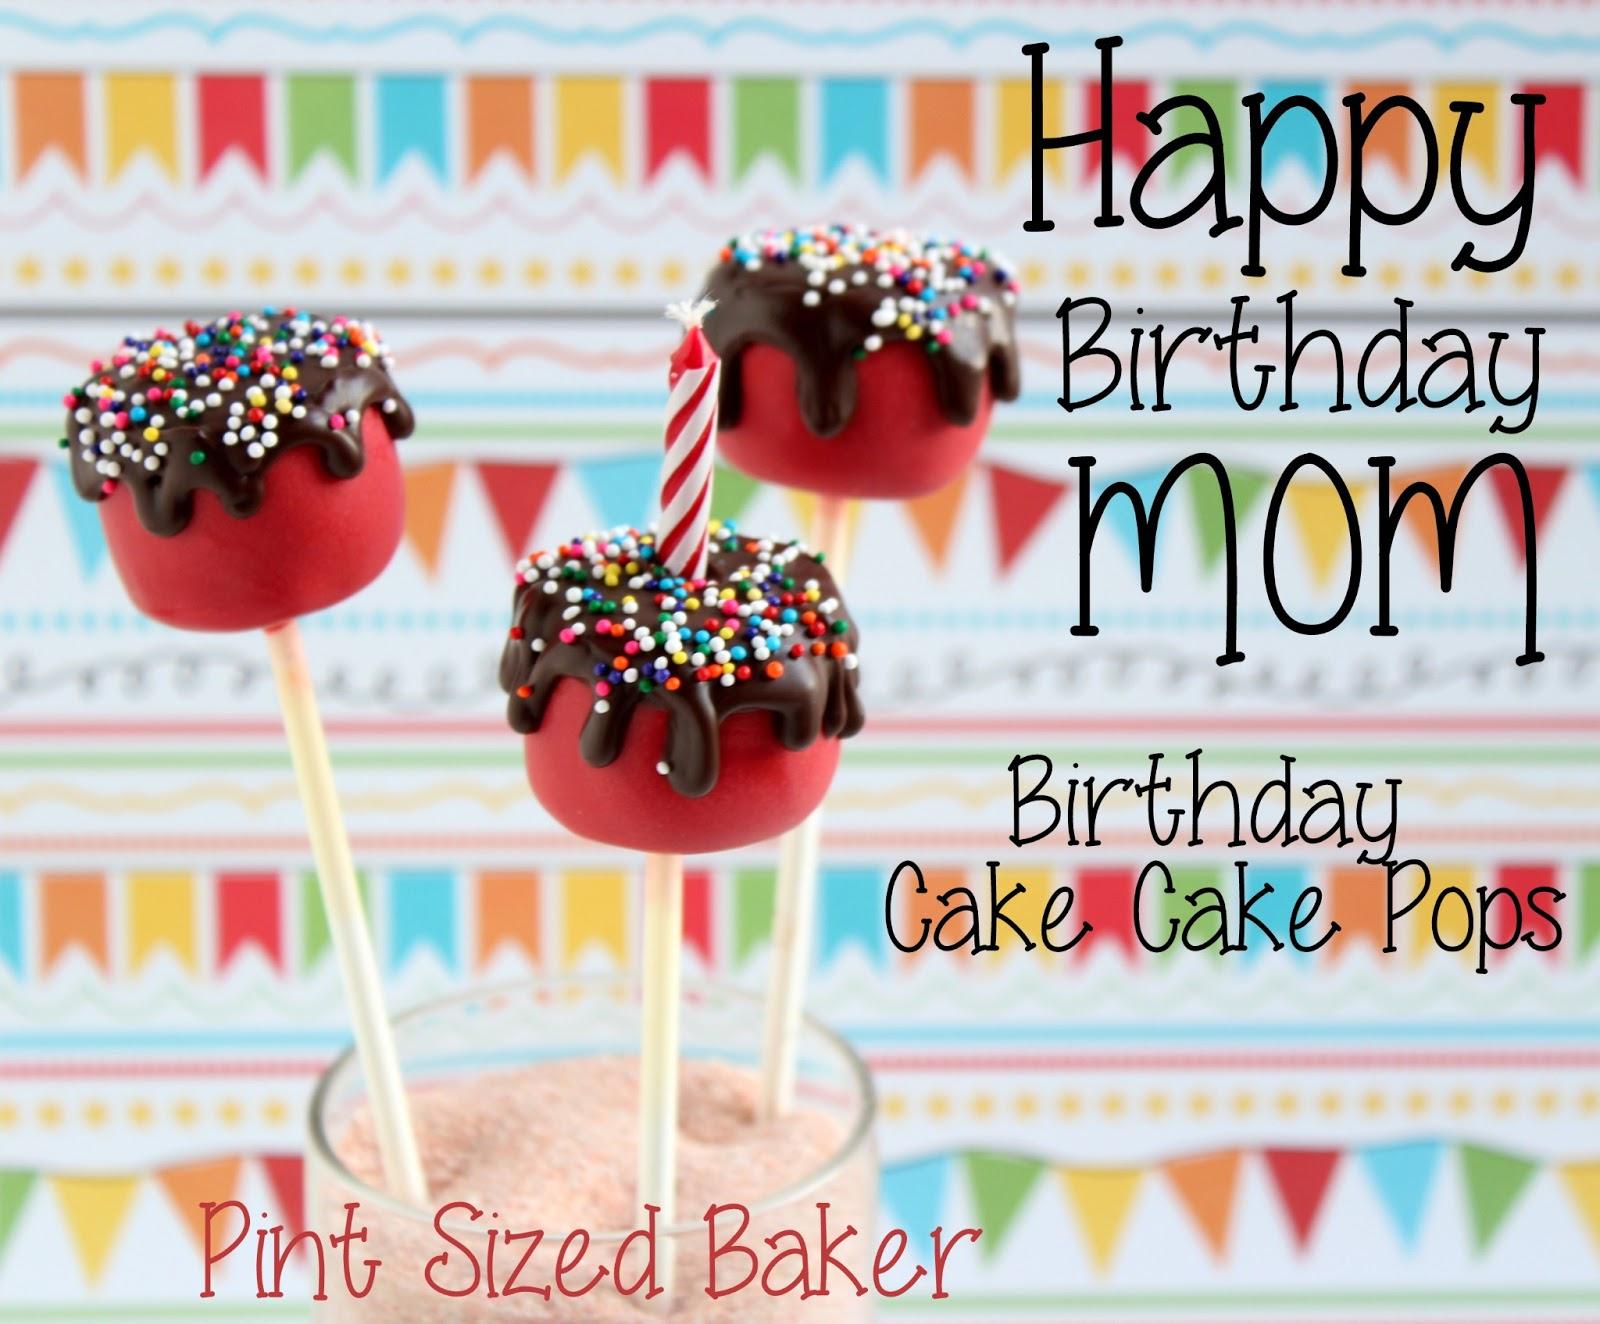 Pint Sized Baker Happy Birthday Cake Cake Pops